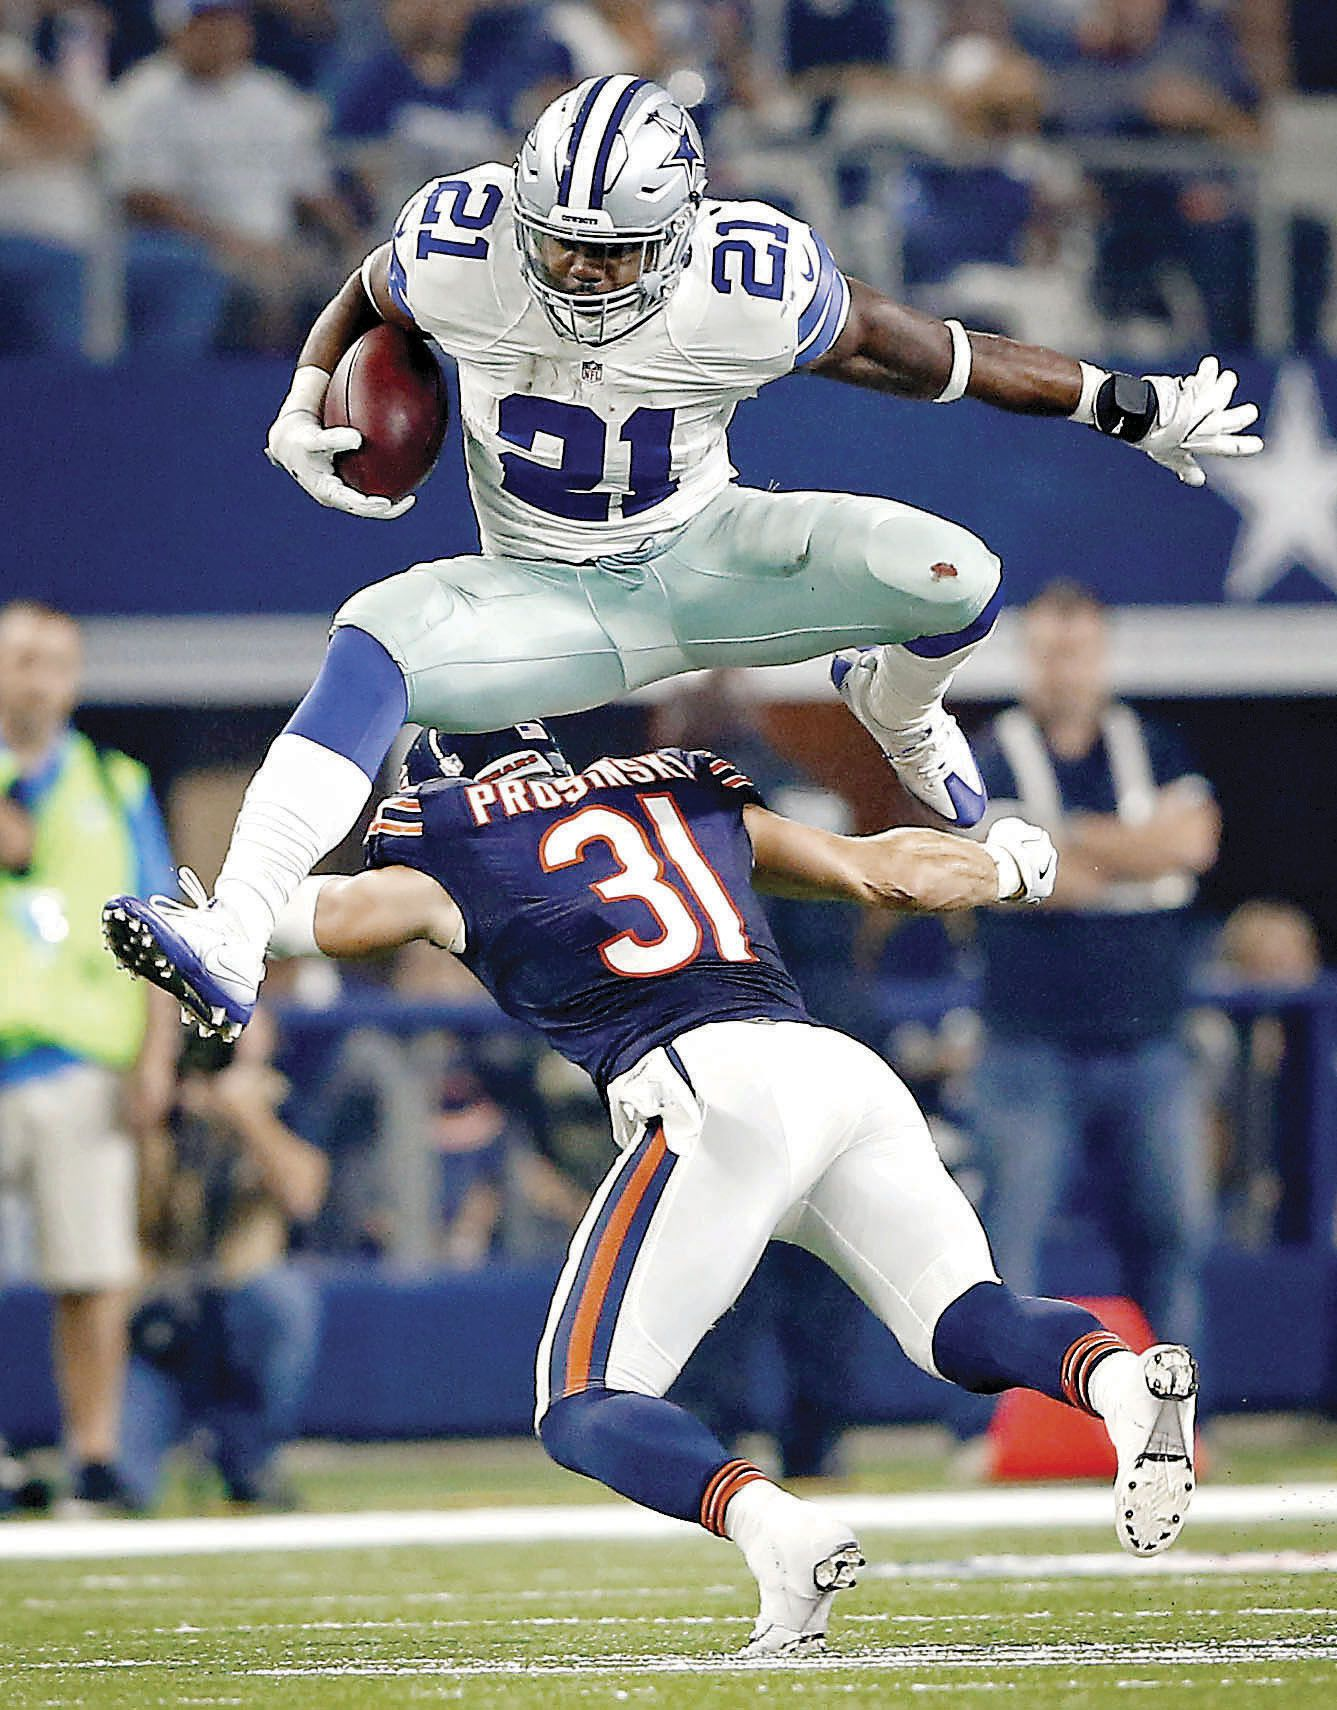 Dallas Cowboys rookie running back Ezekiel Elliott leaped over Chicago Bears safety Chris Prosinski on a run play at AT&T Stadium in Arlington on Sept. 25.